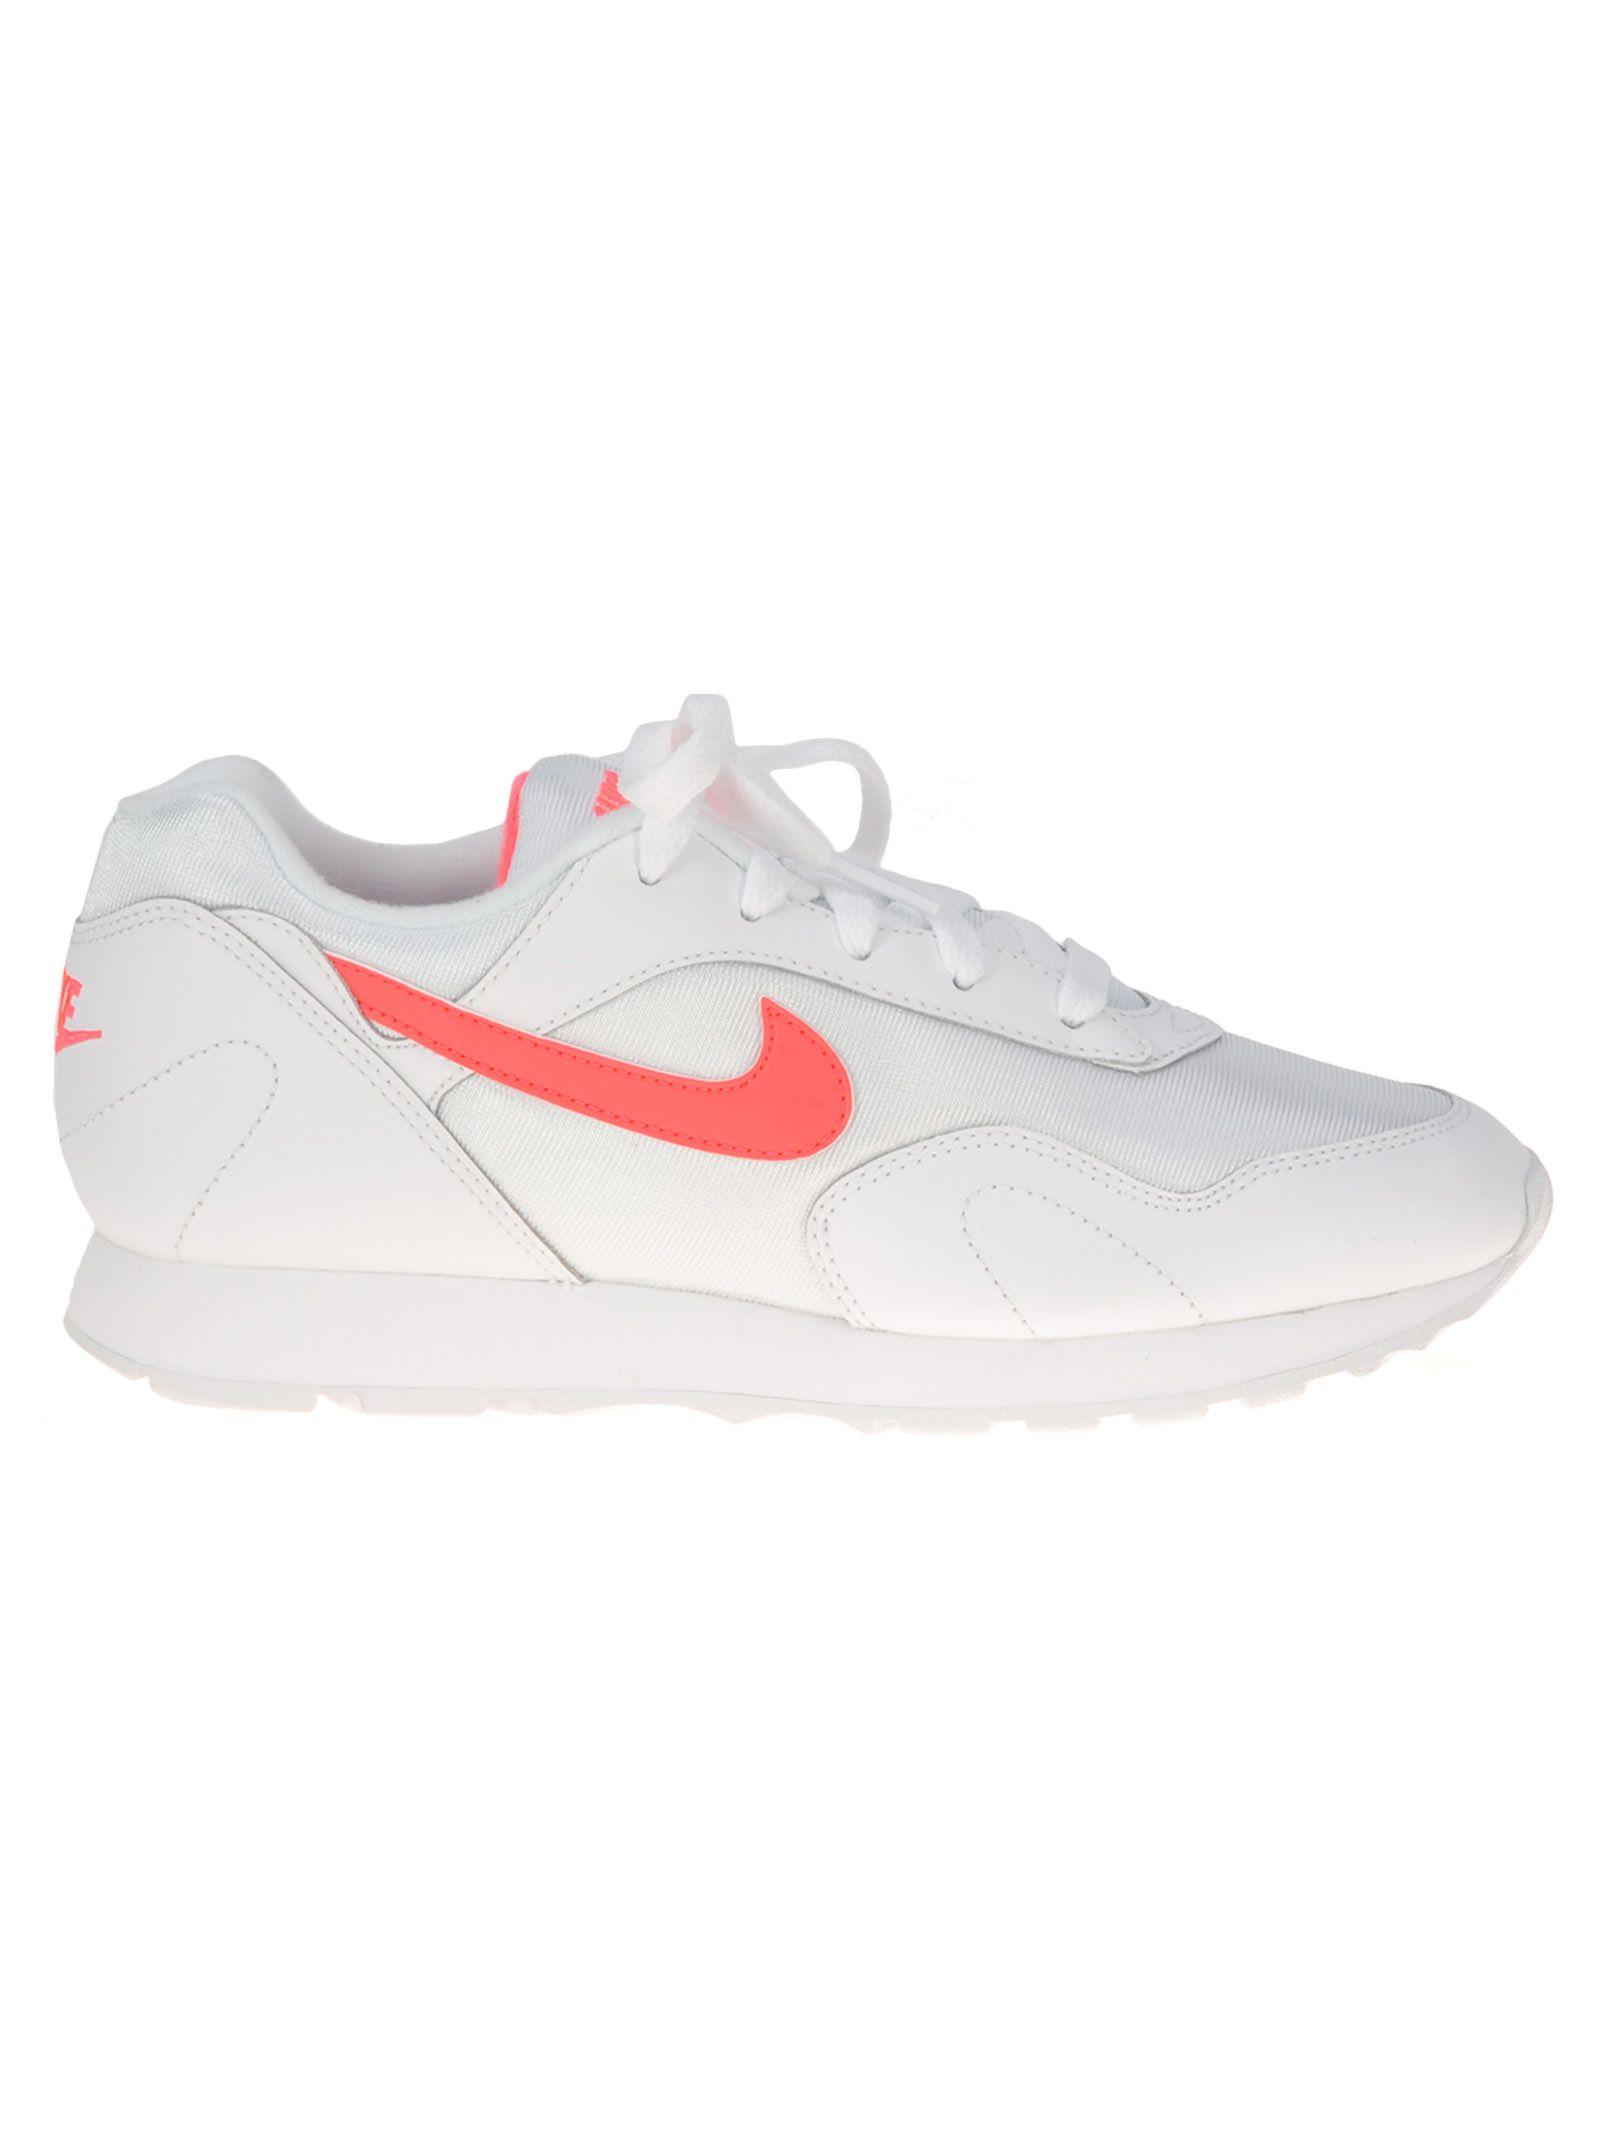 Nike Arrebato Og Rojo Rojo Og Blanco Modesens c32b69